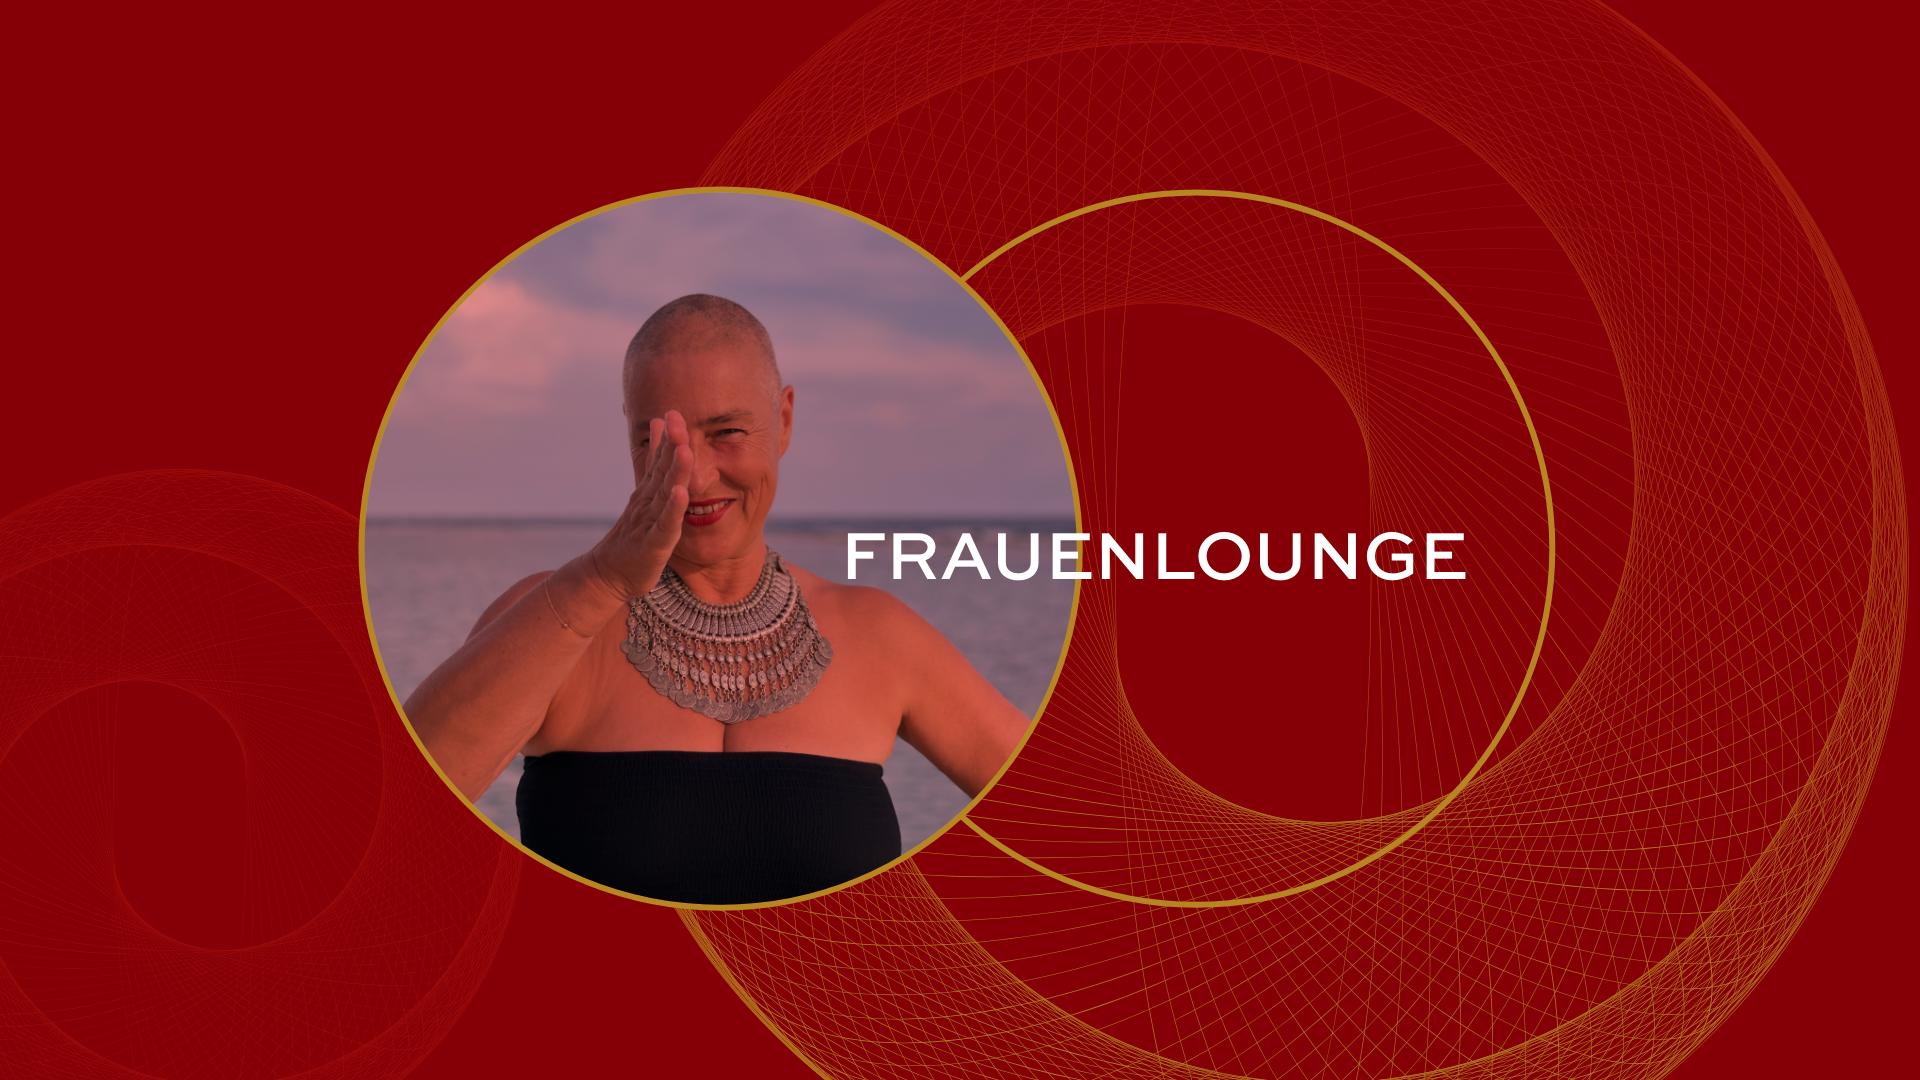 frauenlounge-1920x1080-FT94